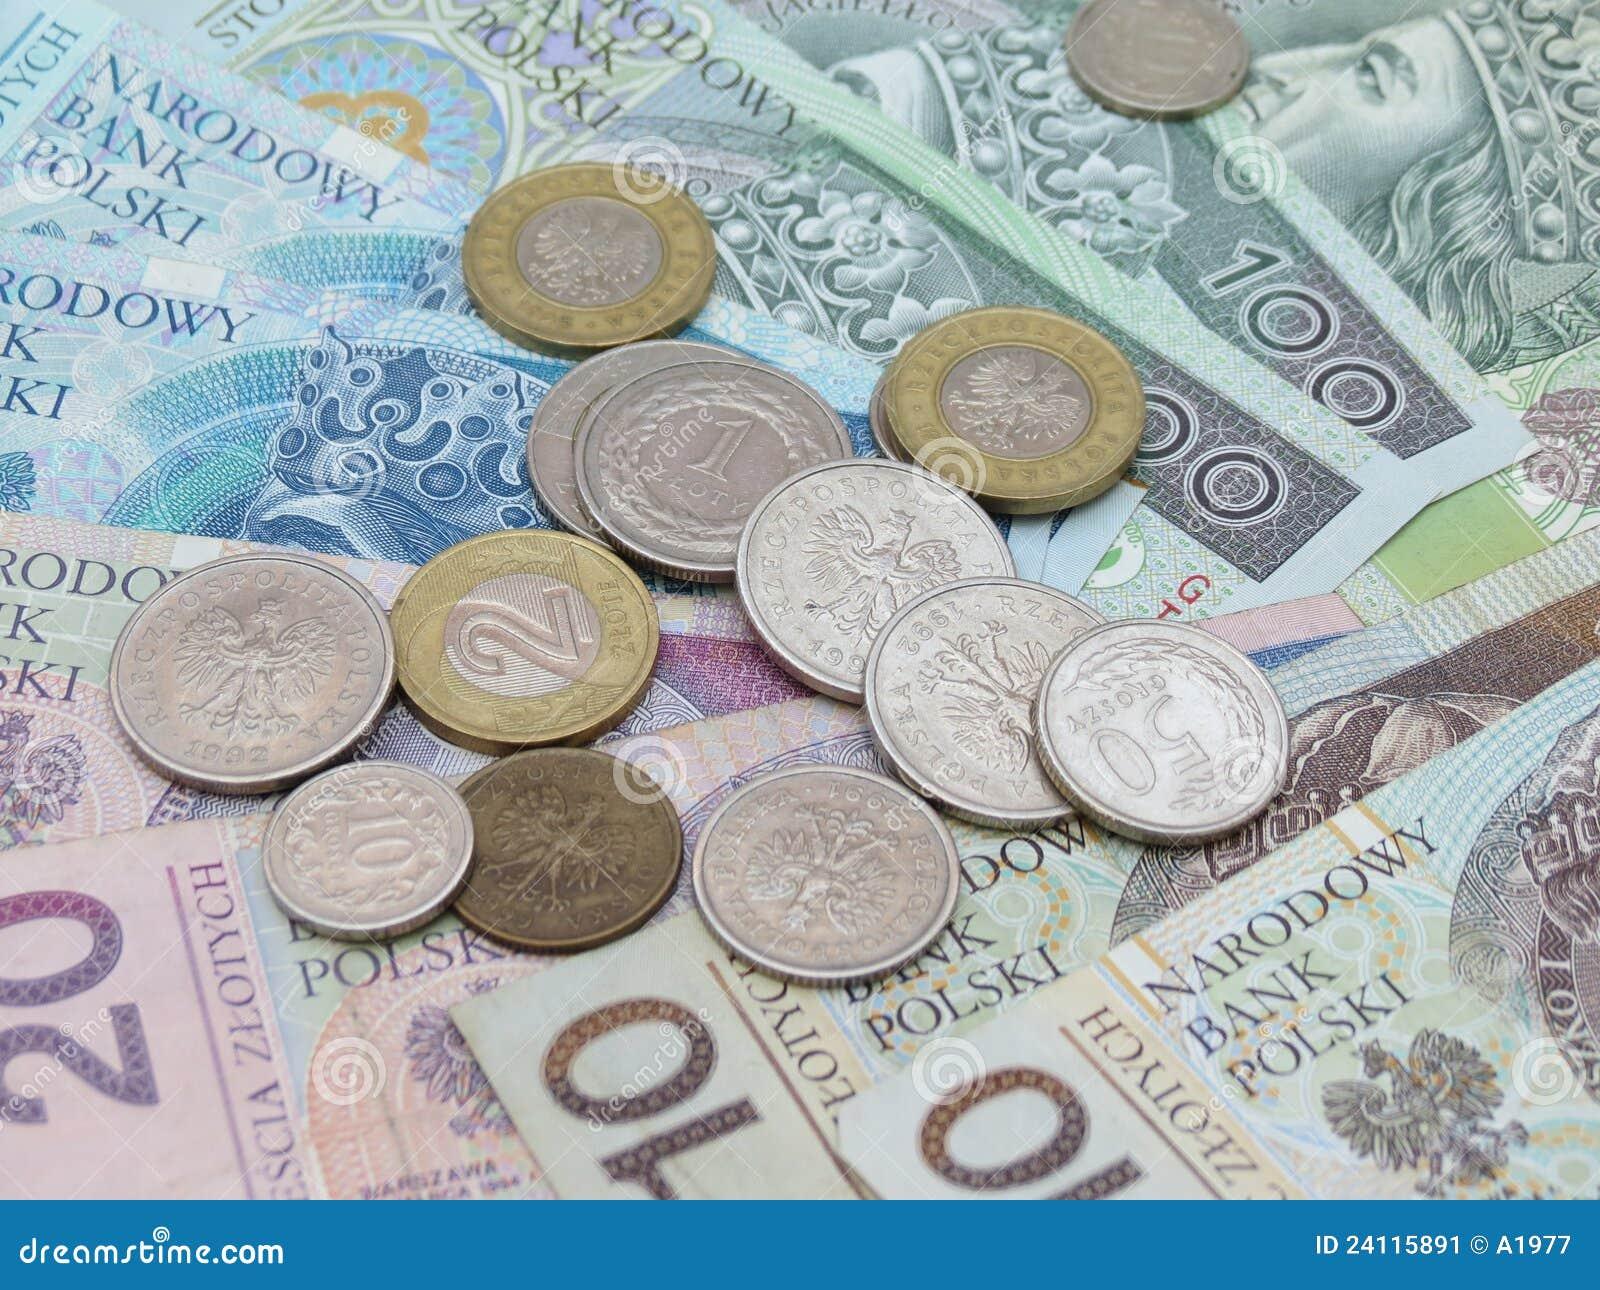 Polish Currency Symbol Antoniaeyre7wtl